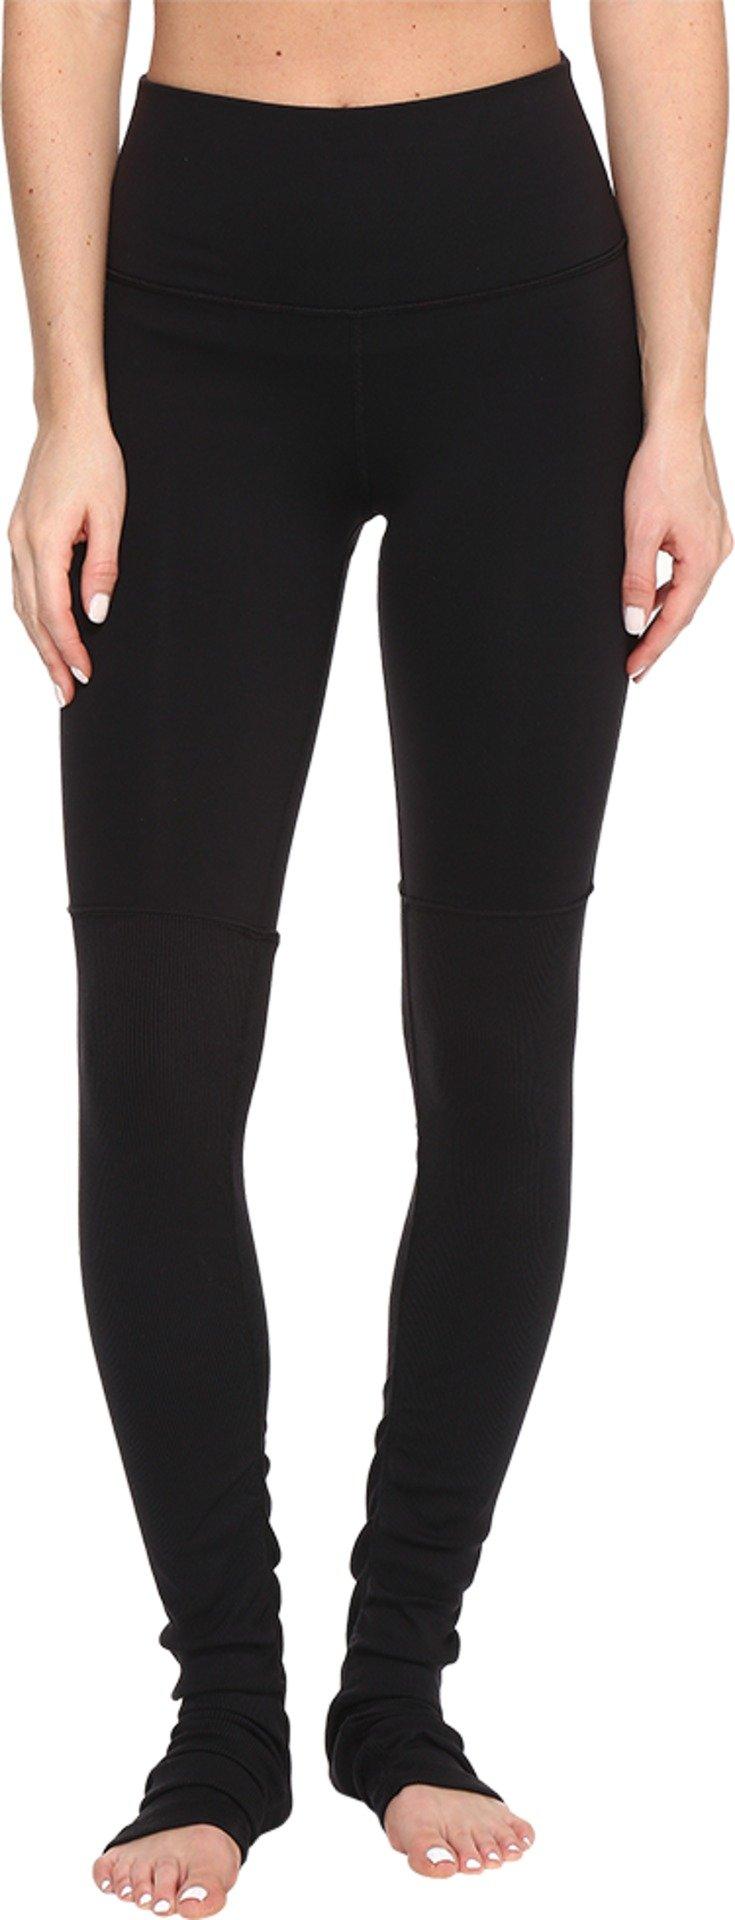 ALO Women's High Waisted Goddess Leggings Black/Black X-Small 33 by ALO Sport (Image #1)